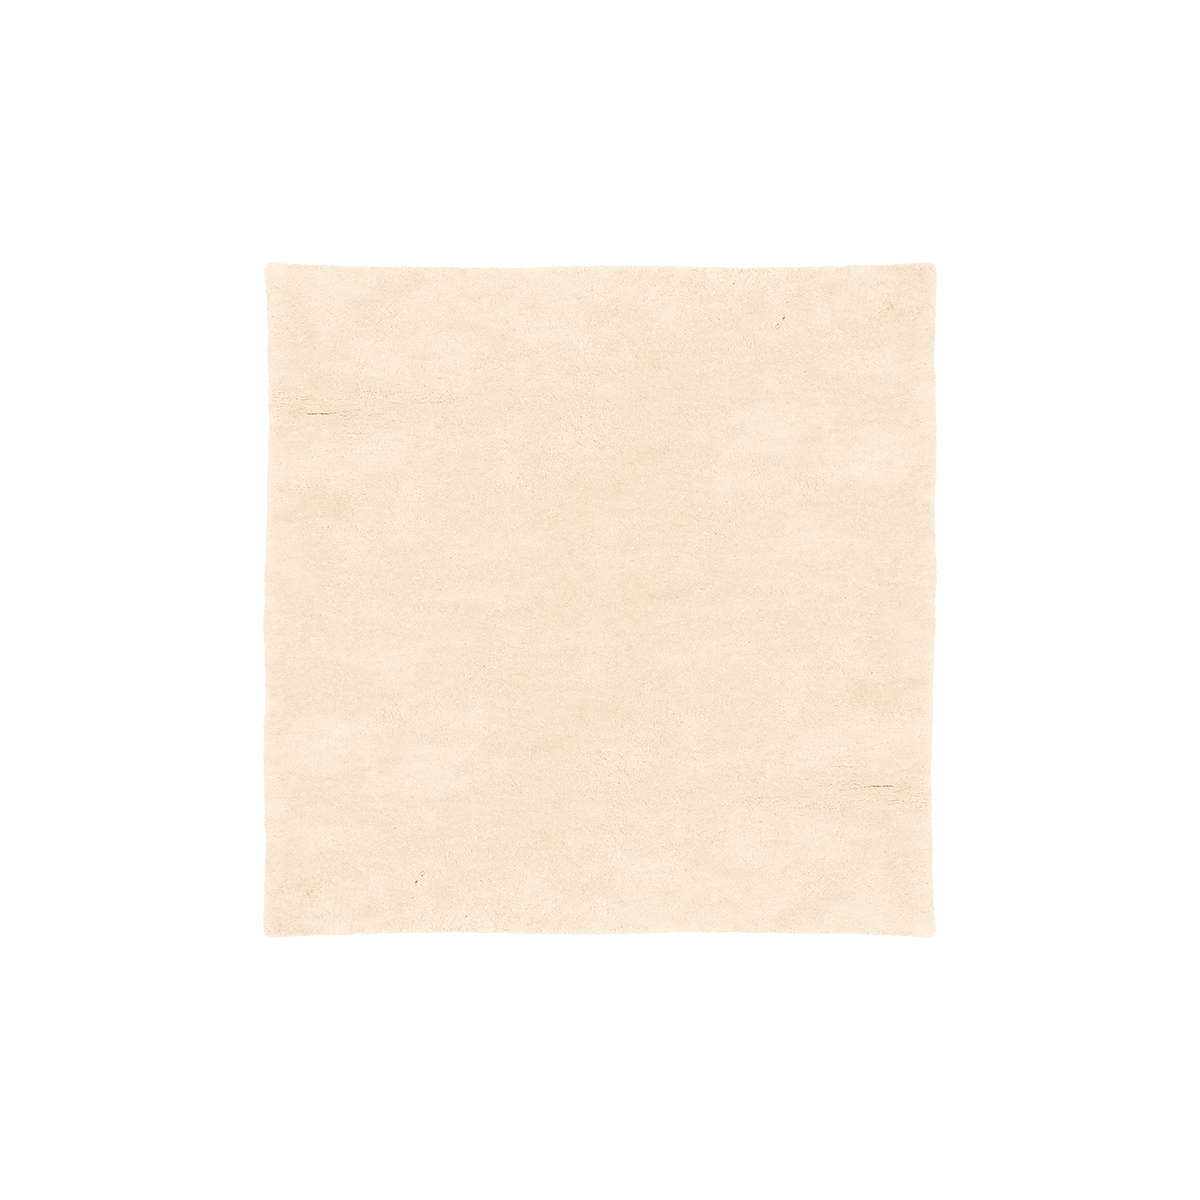 Tapis Velluto blanc casse 200 x 200